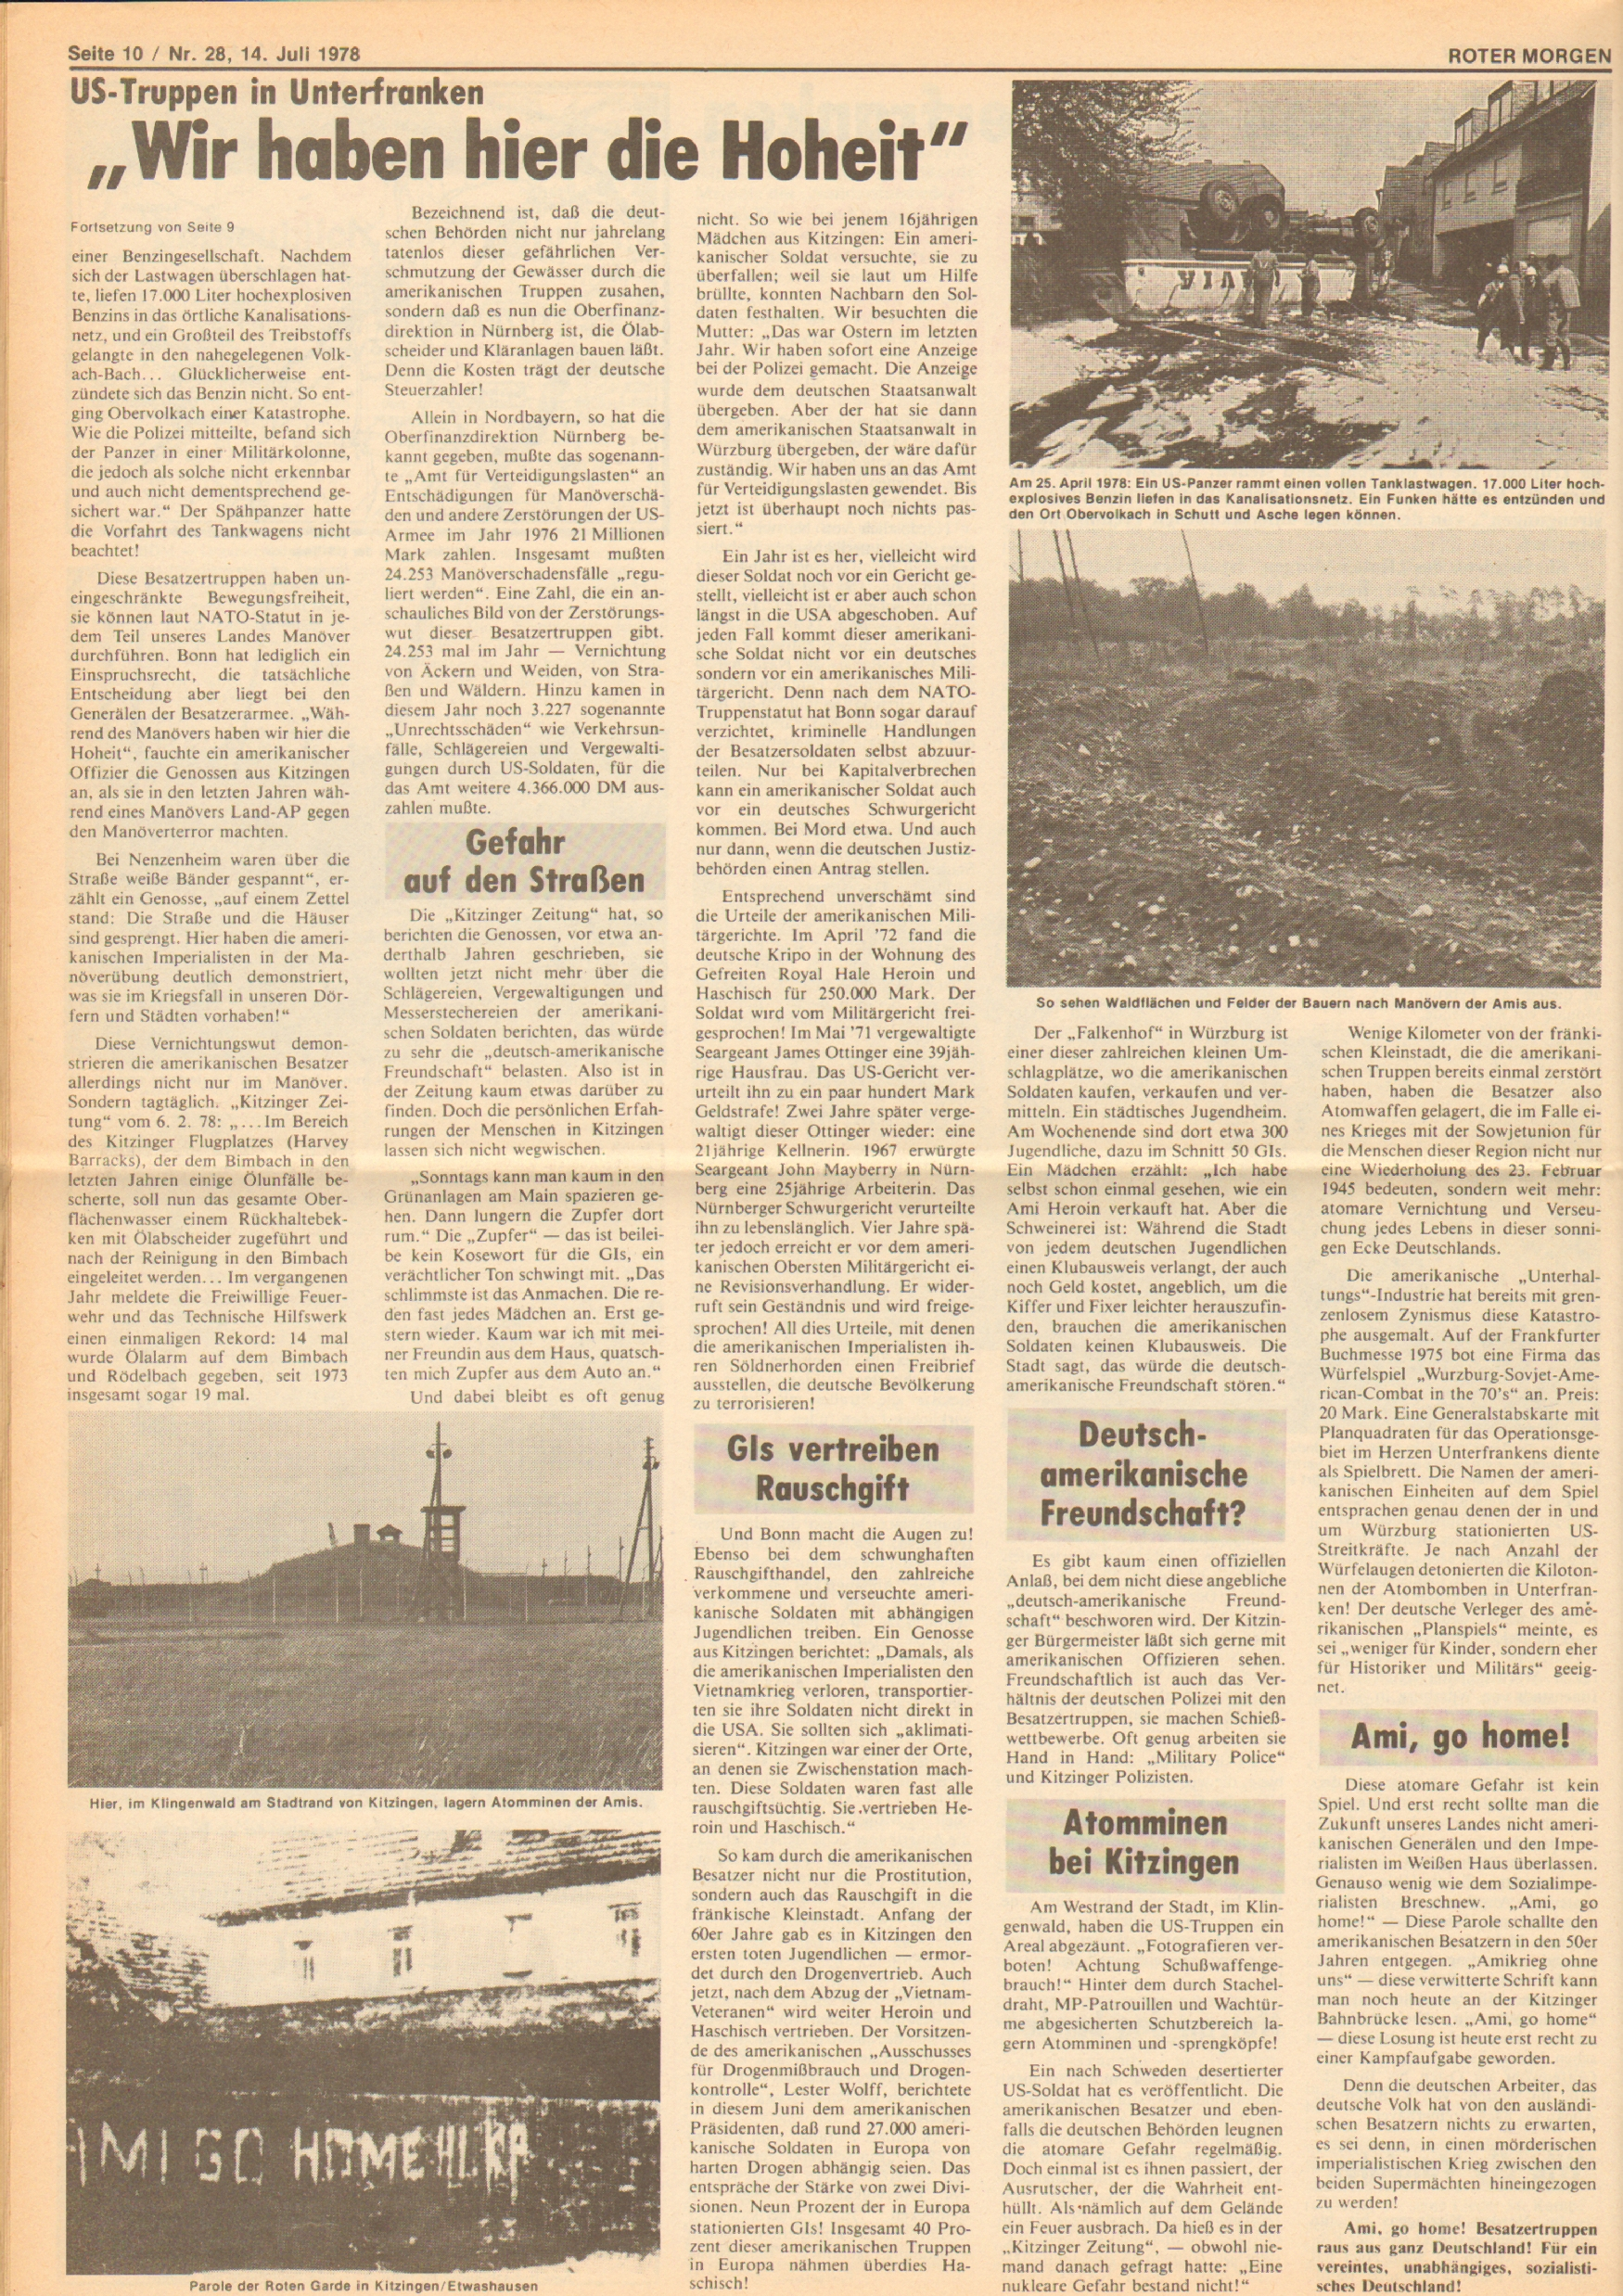 Roter Morgen, 12. Jg., 16. Juli 1978, Nr. 28, Seite 10